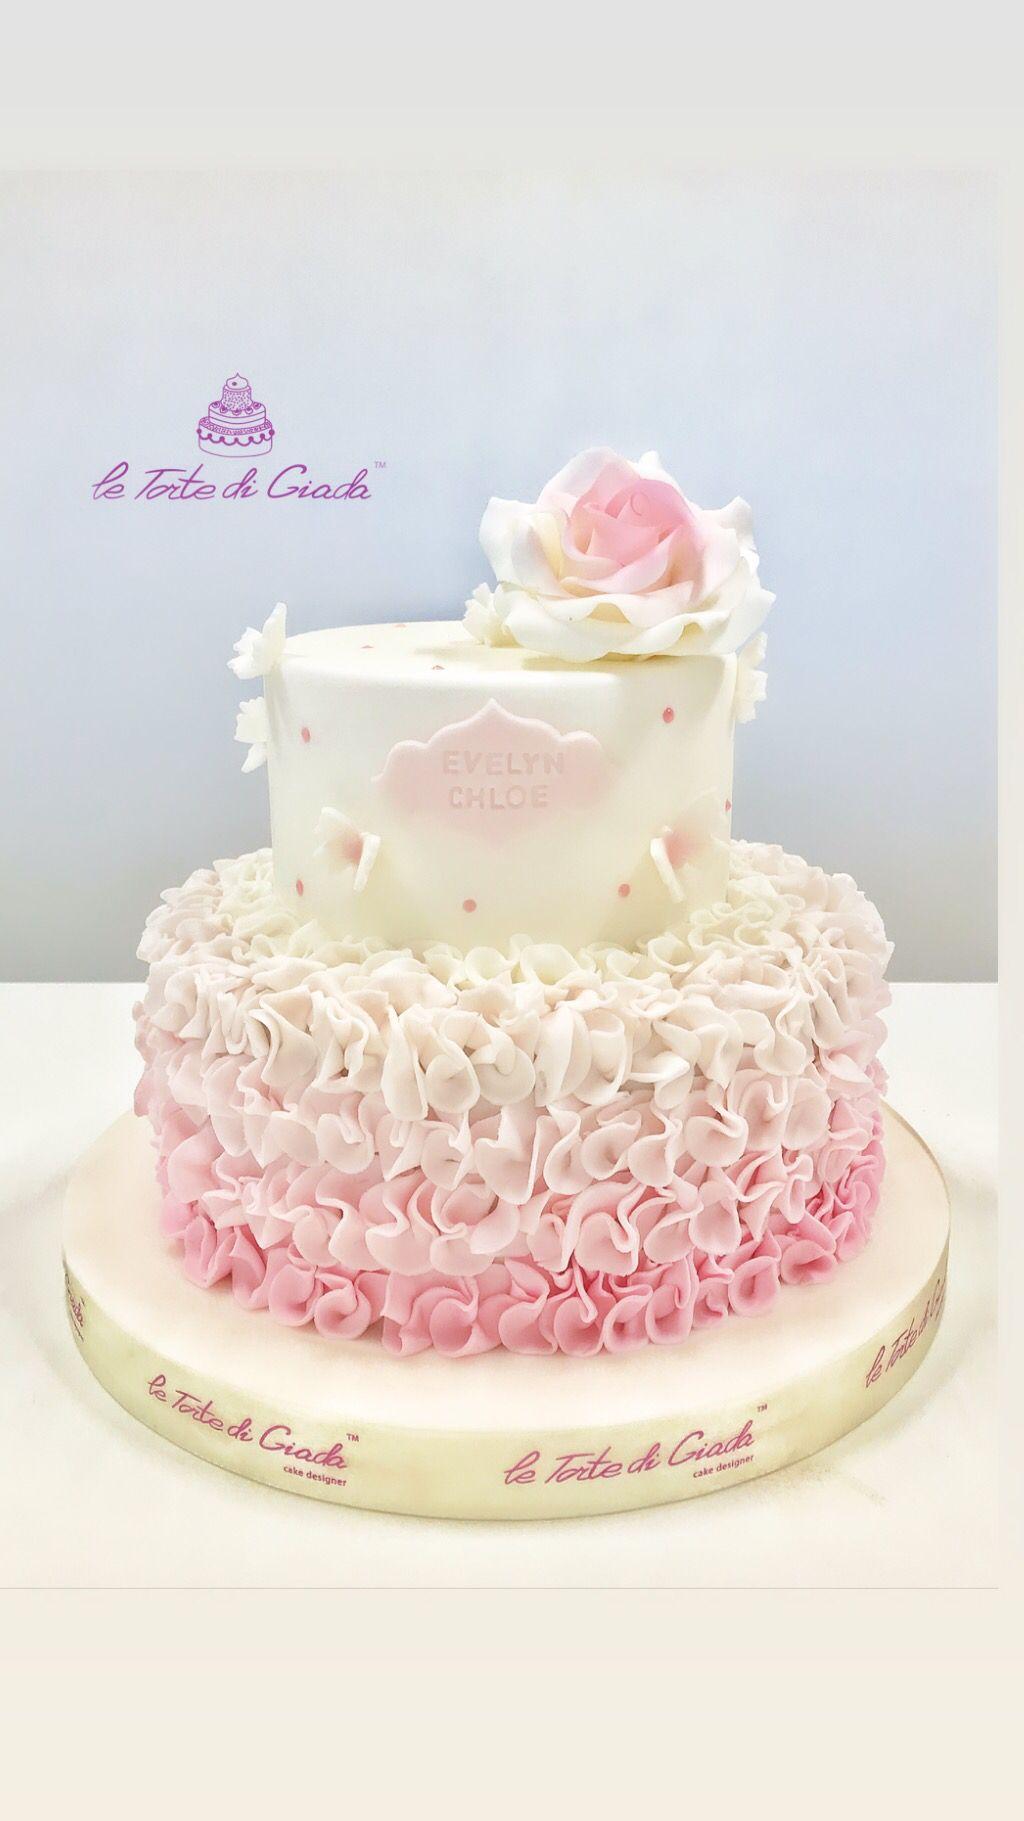 Fiori In Pasta Di Zucchero.Torta Da Battesimo In Pasta Di Zucchero Con Farfalle E Fiori E